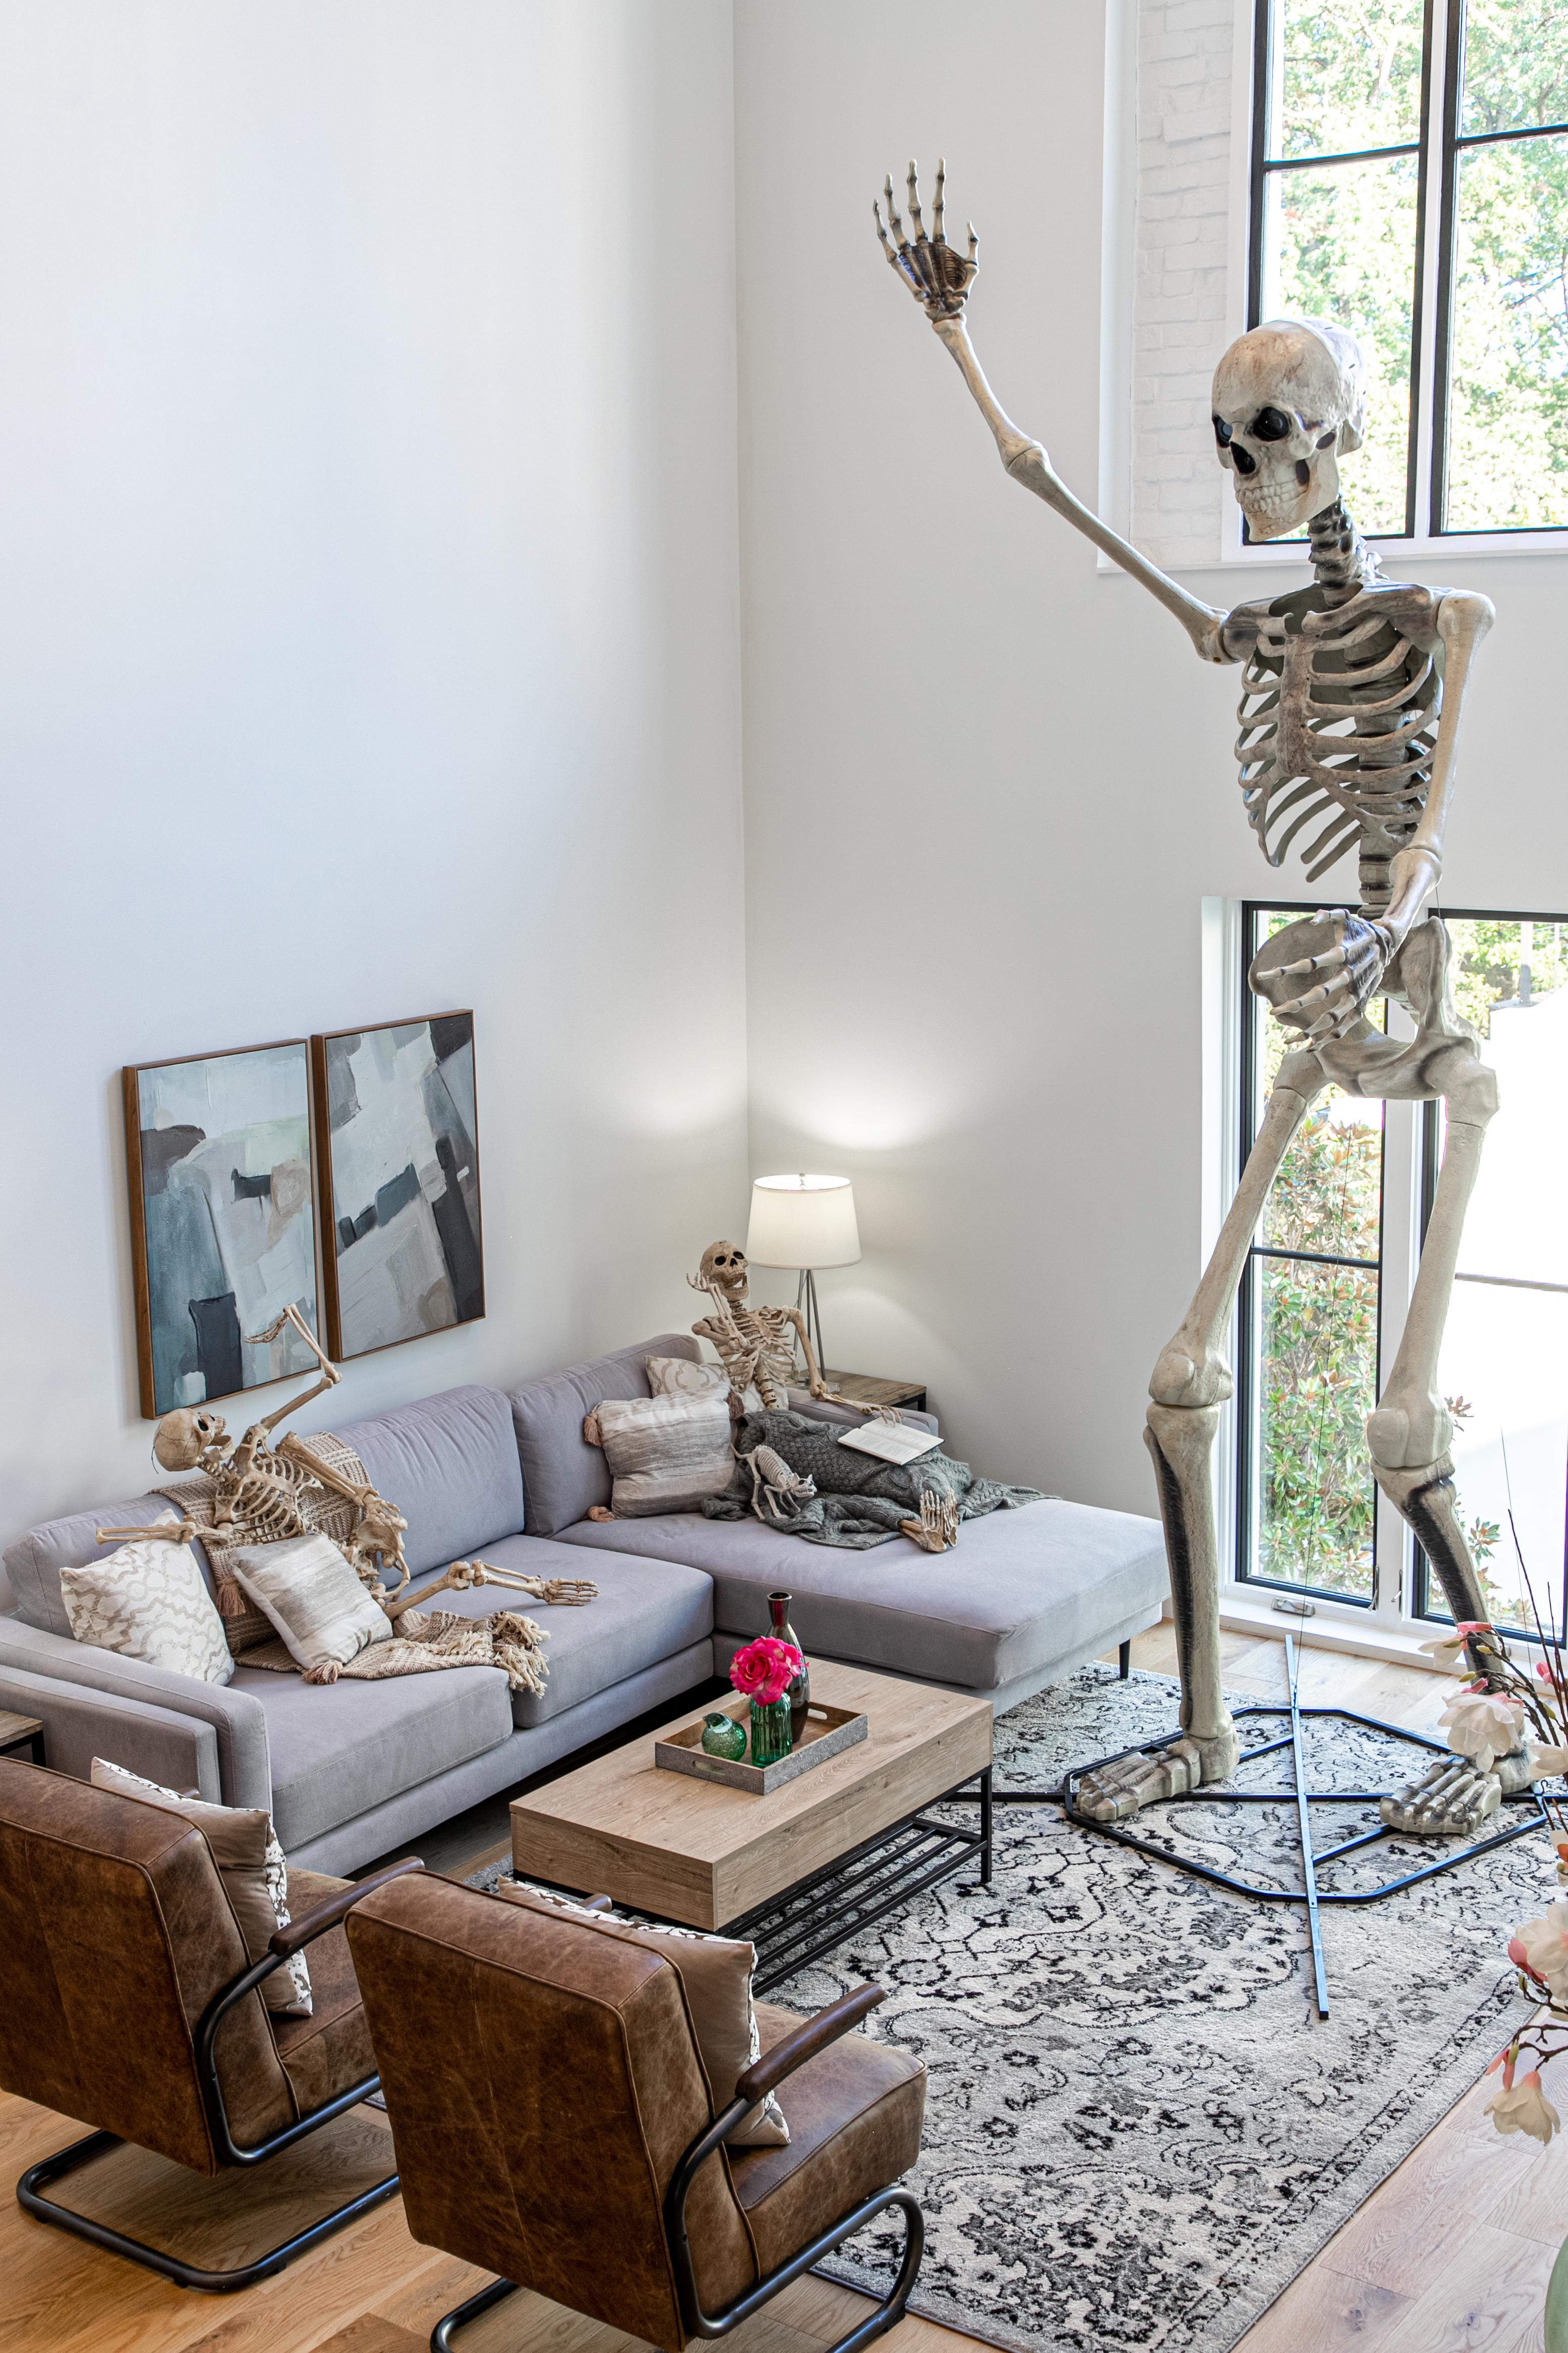 Can The Giant Home Depot Skeleton Save Halloween The Washington Post